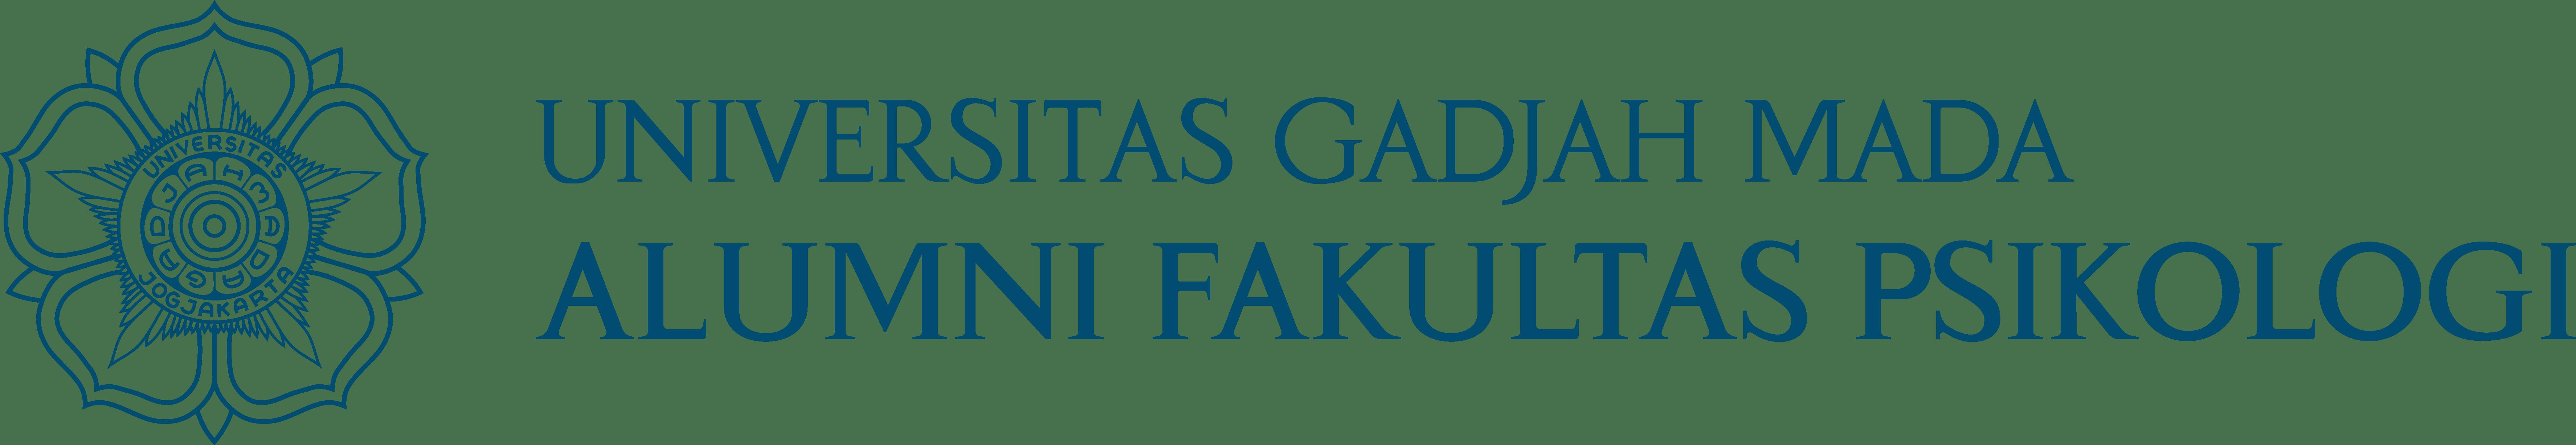 Alumni Fakultas Psikologi Universitas Gadjah Mada